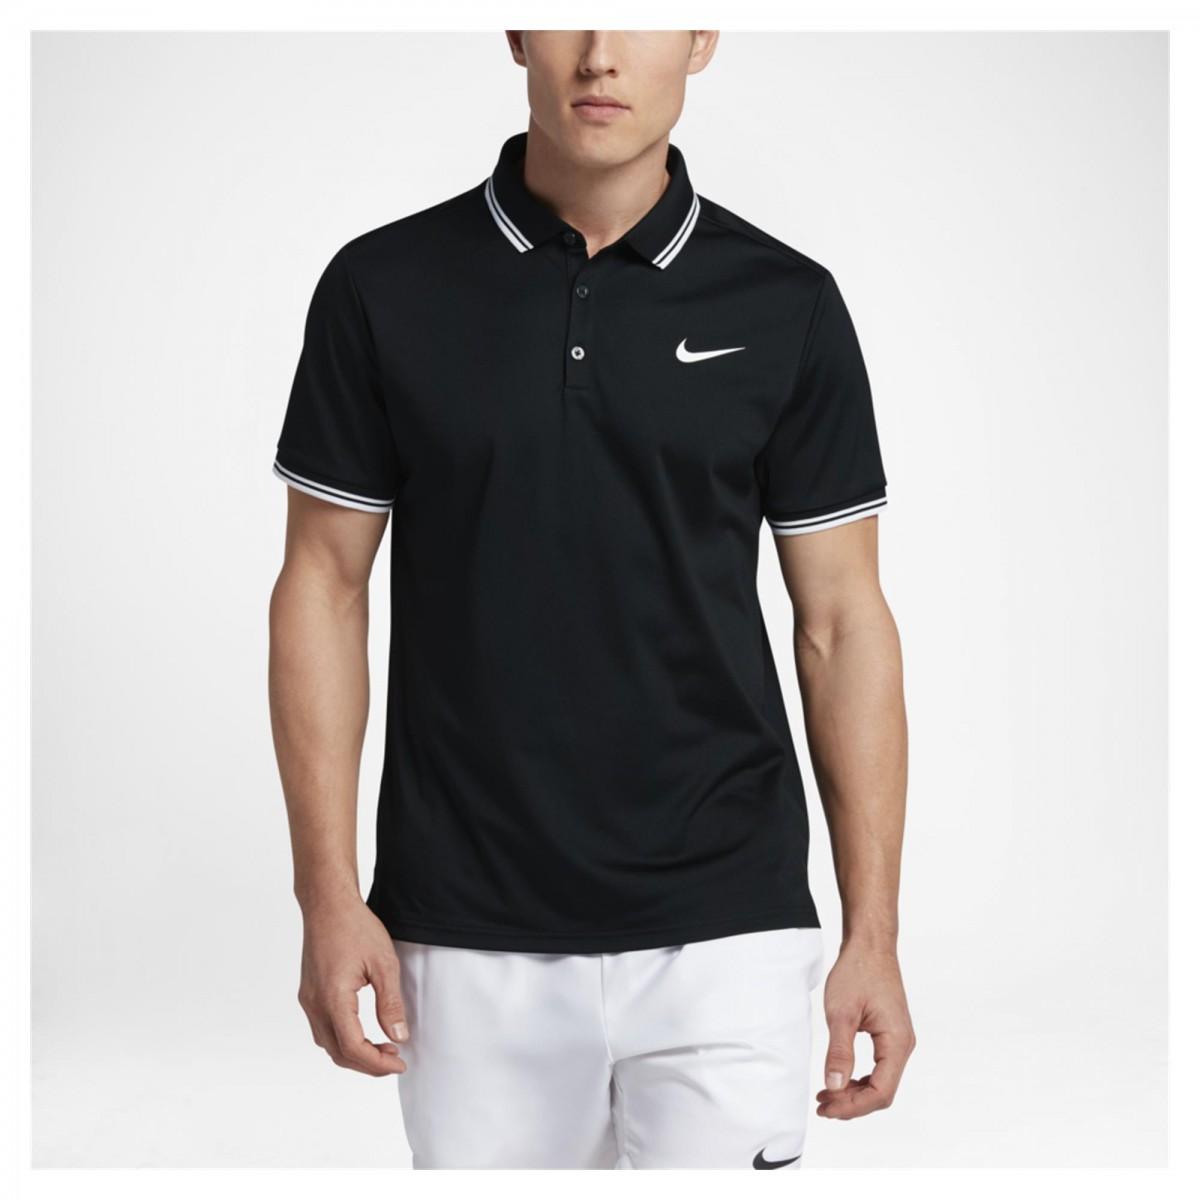 fcae2d066f775 Bizz Store - Camisa Polo Masculina Nike Court Dry Solid Preta